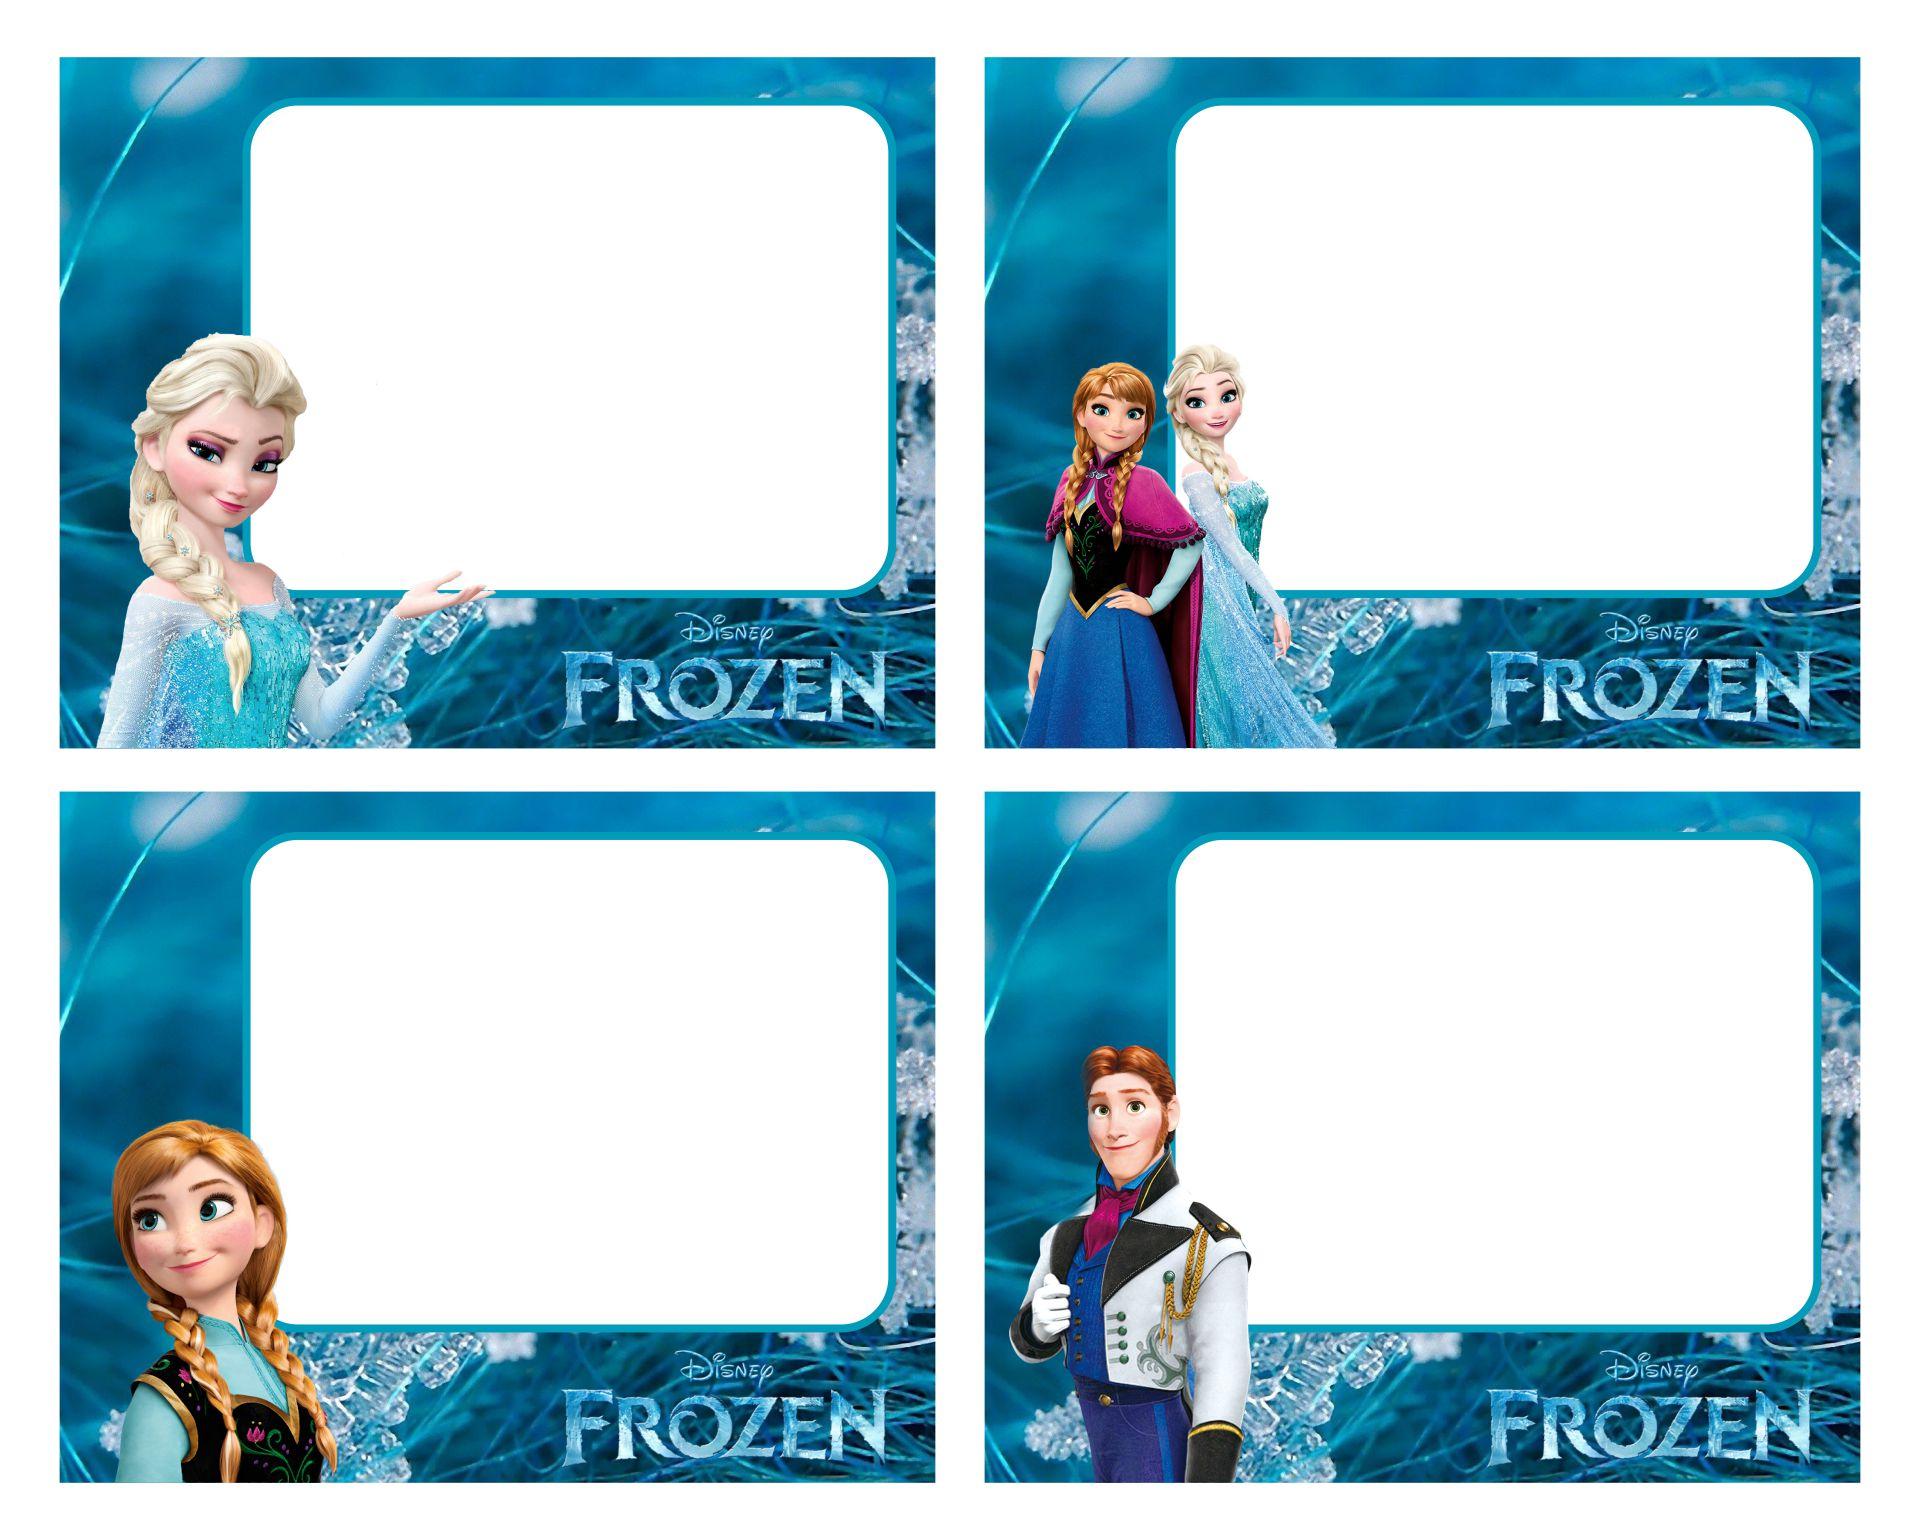 - 8 Best Images Of Frozen Printable Food Tags - Disney Frozen Food